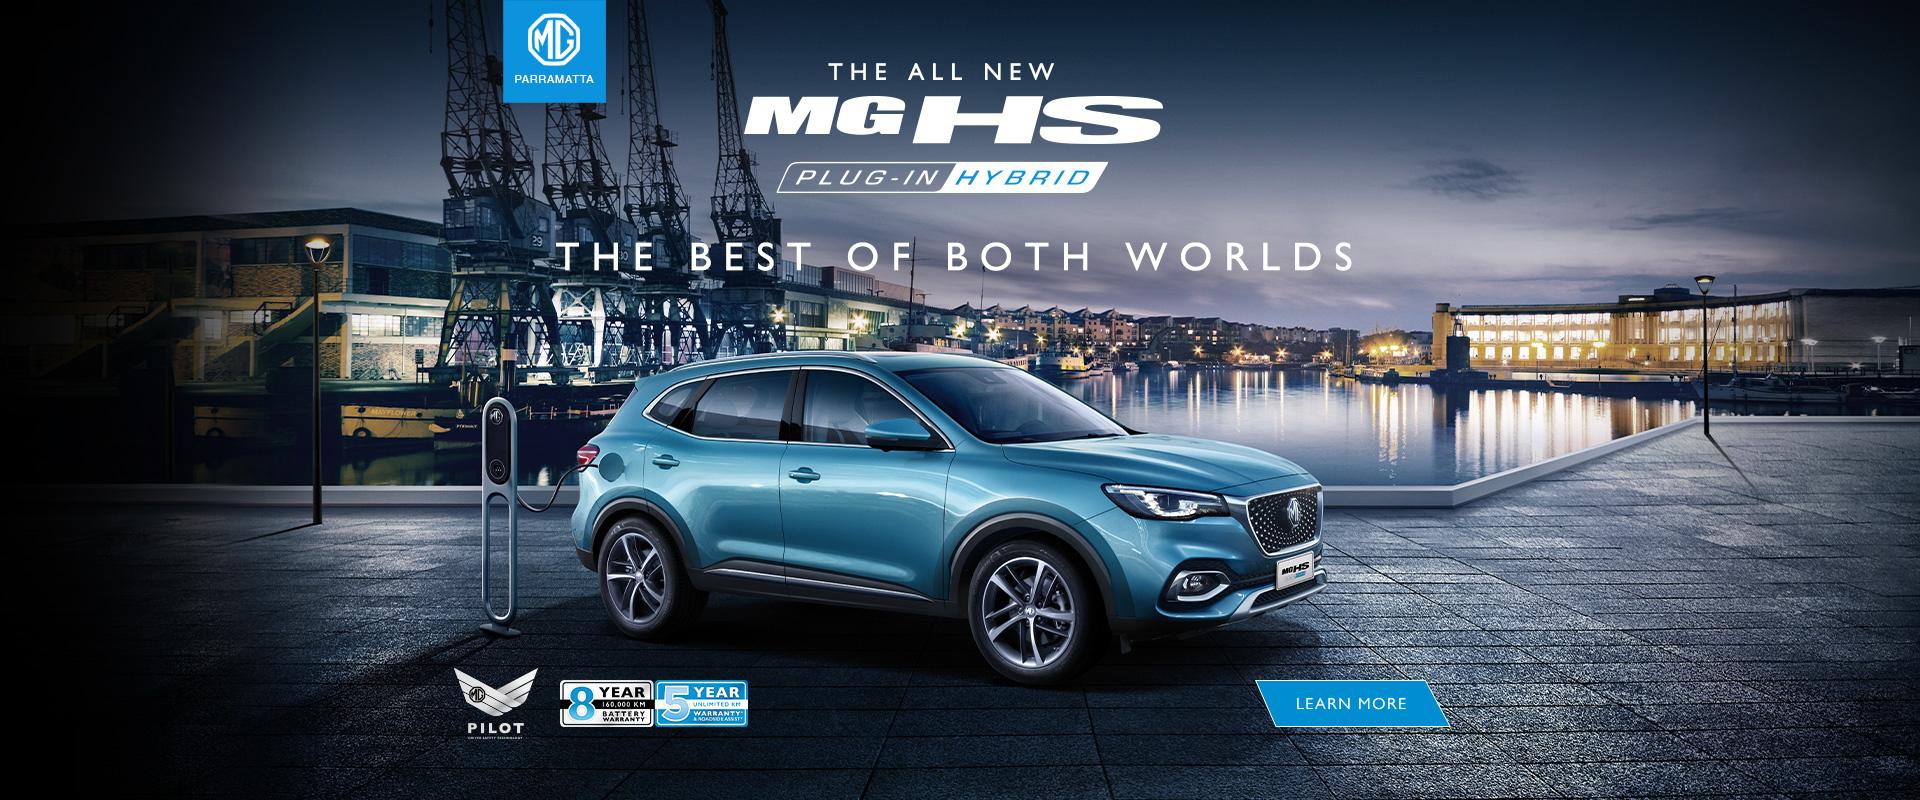 MG HS Plug-In Hybrid | Register Your Interest | Parramatta MG, Sydney